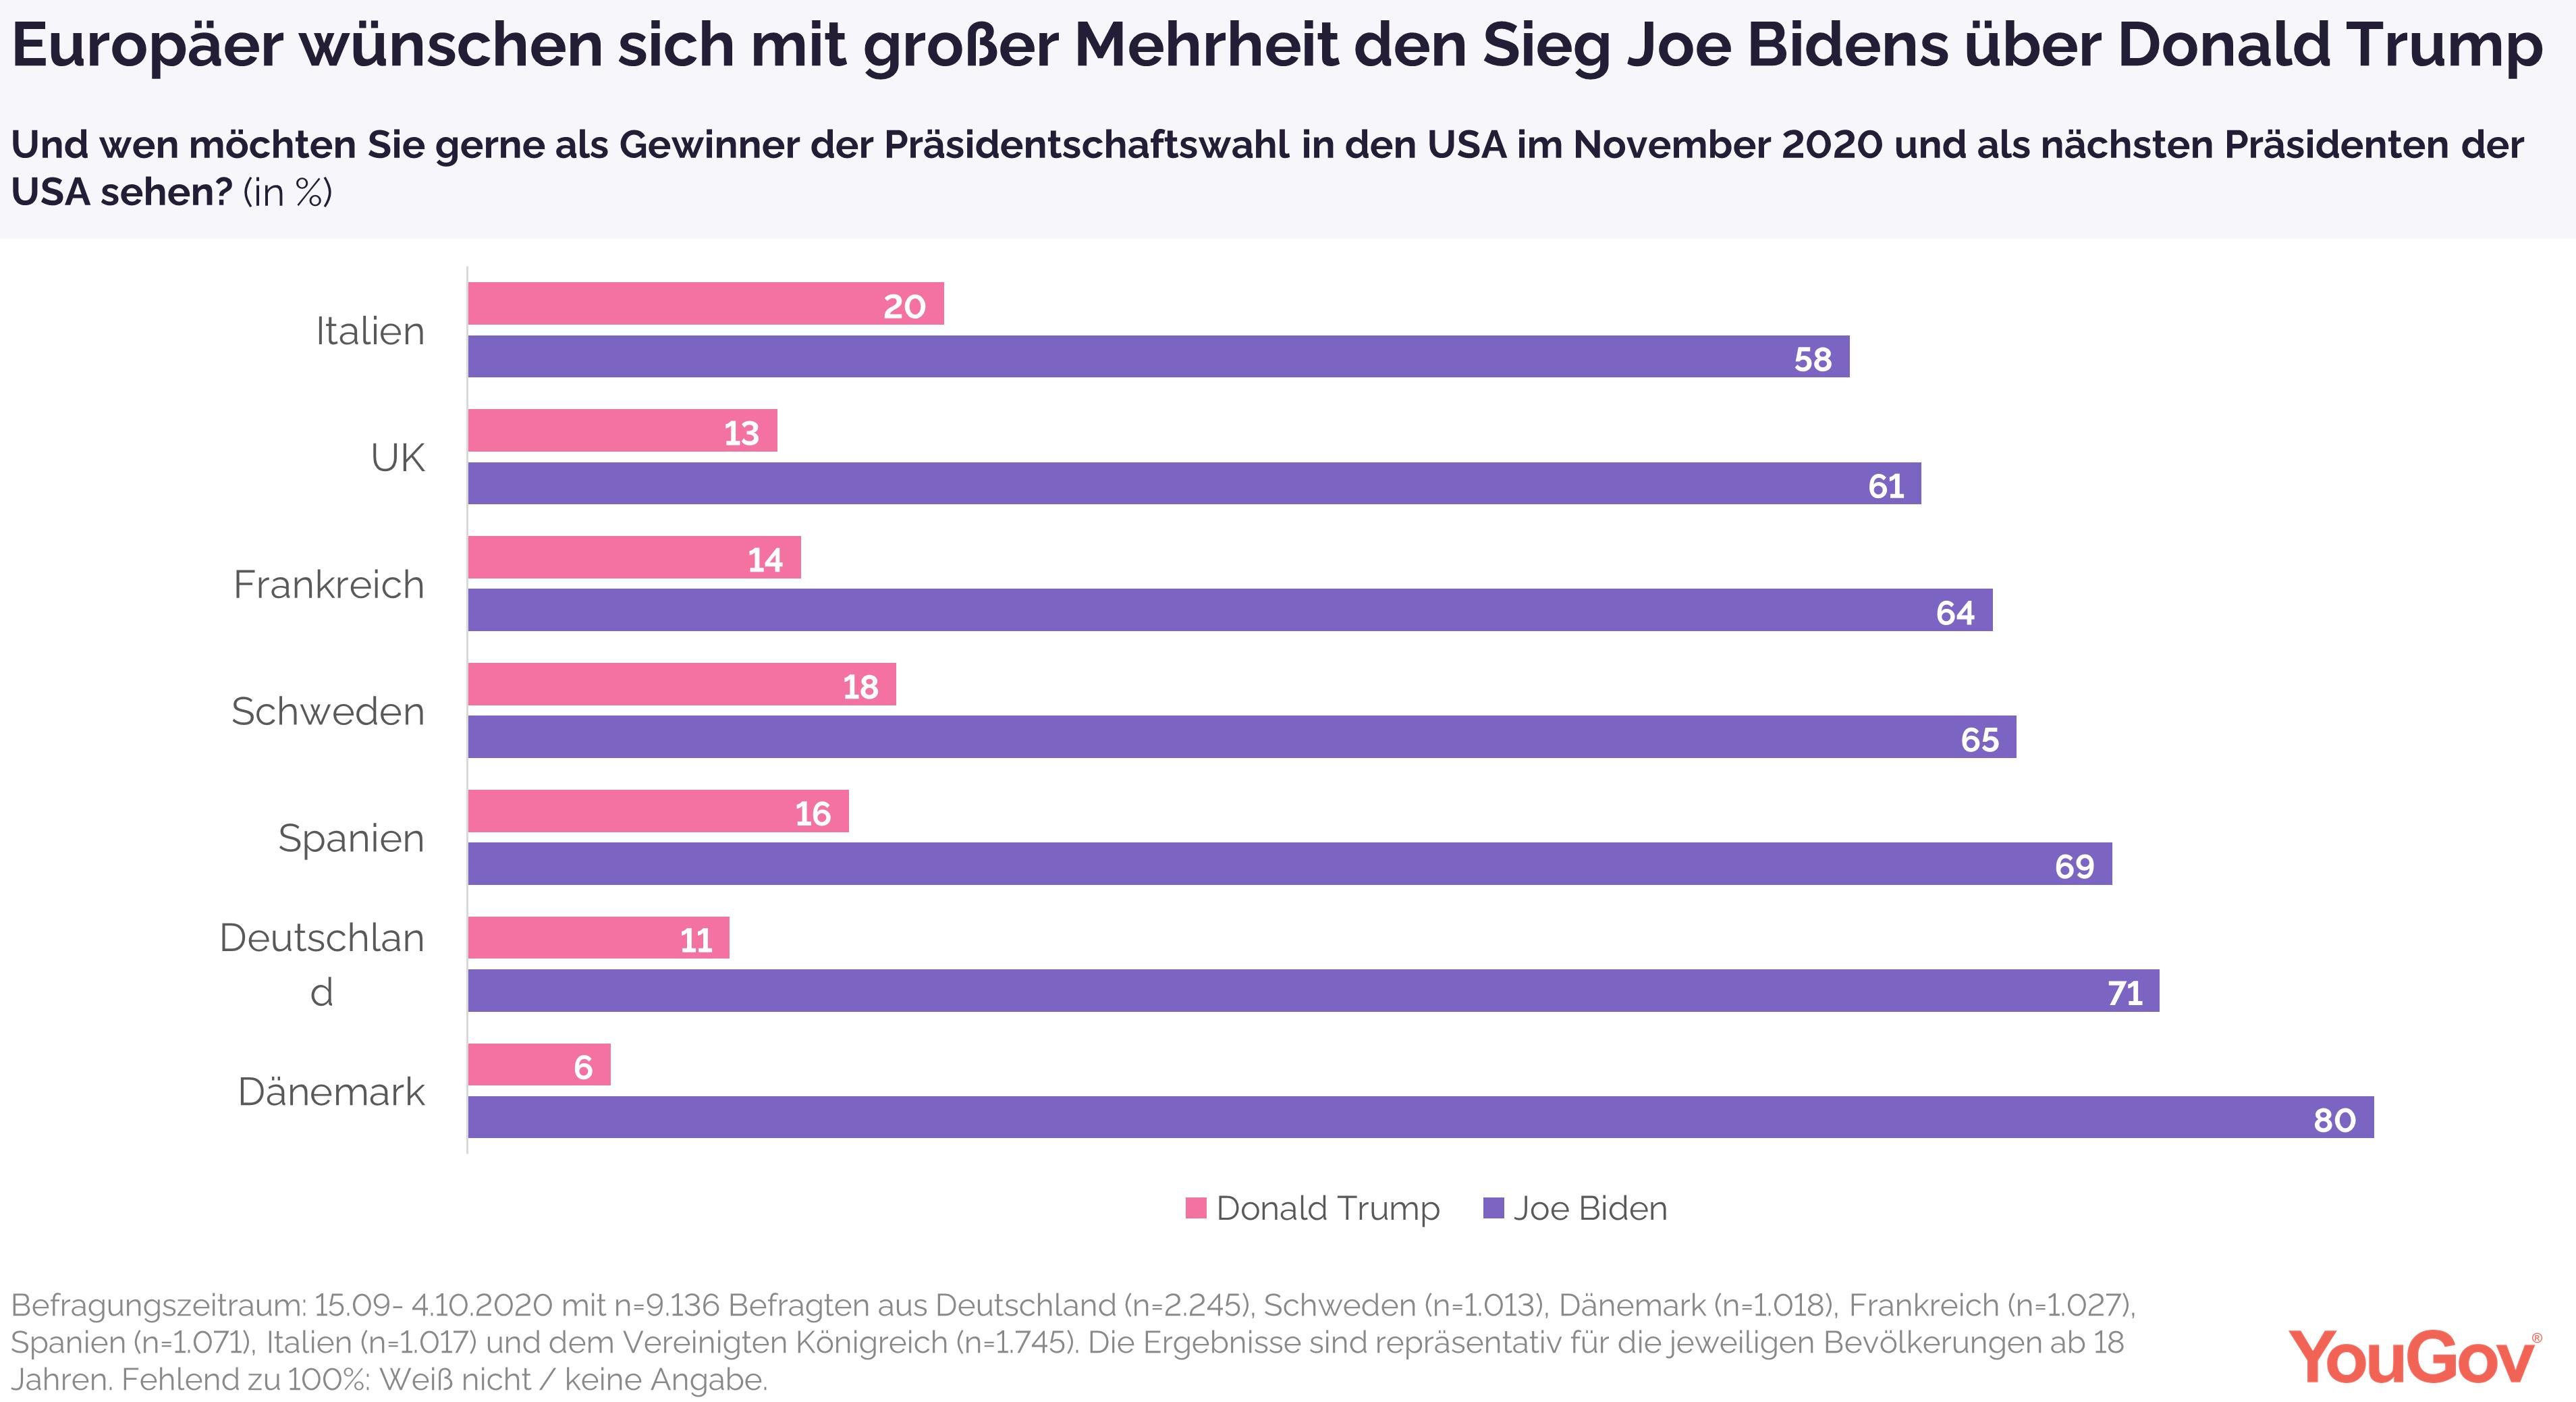 Europäer wünschen sich Sieg Joe Bidens über Donald Trump